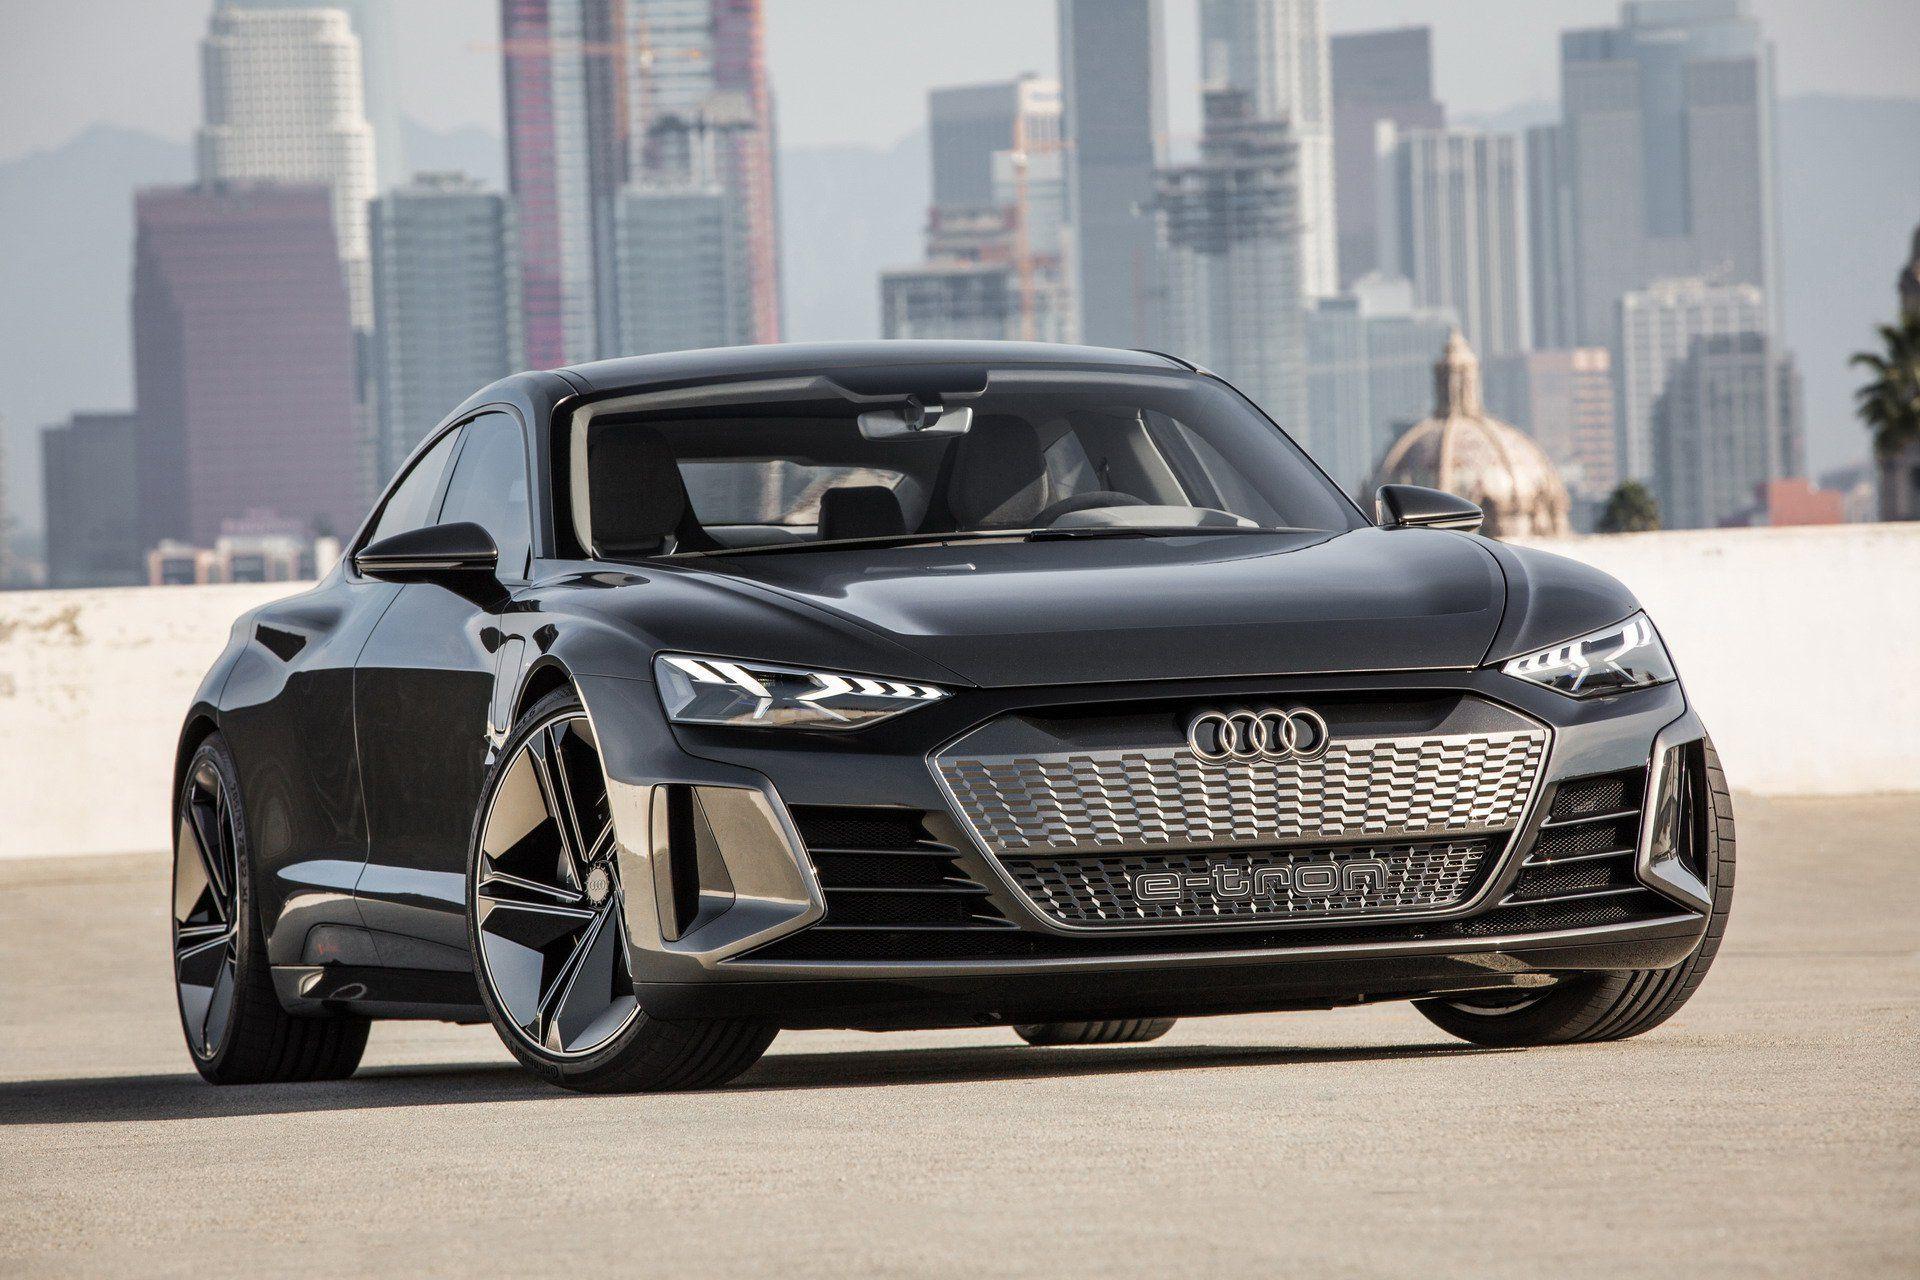 Audi E Tron Gt Is An Electrifying Super Sedan That S Coming In 2020 Carscoops Audi E Tron Audi E Tron